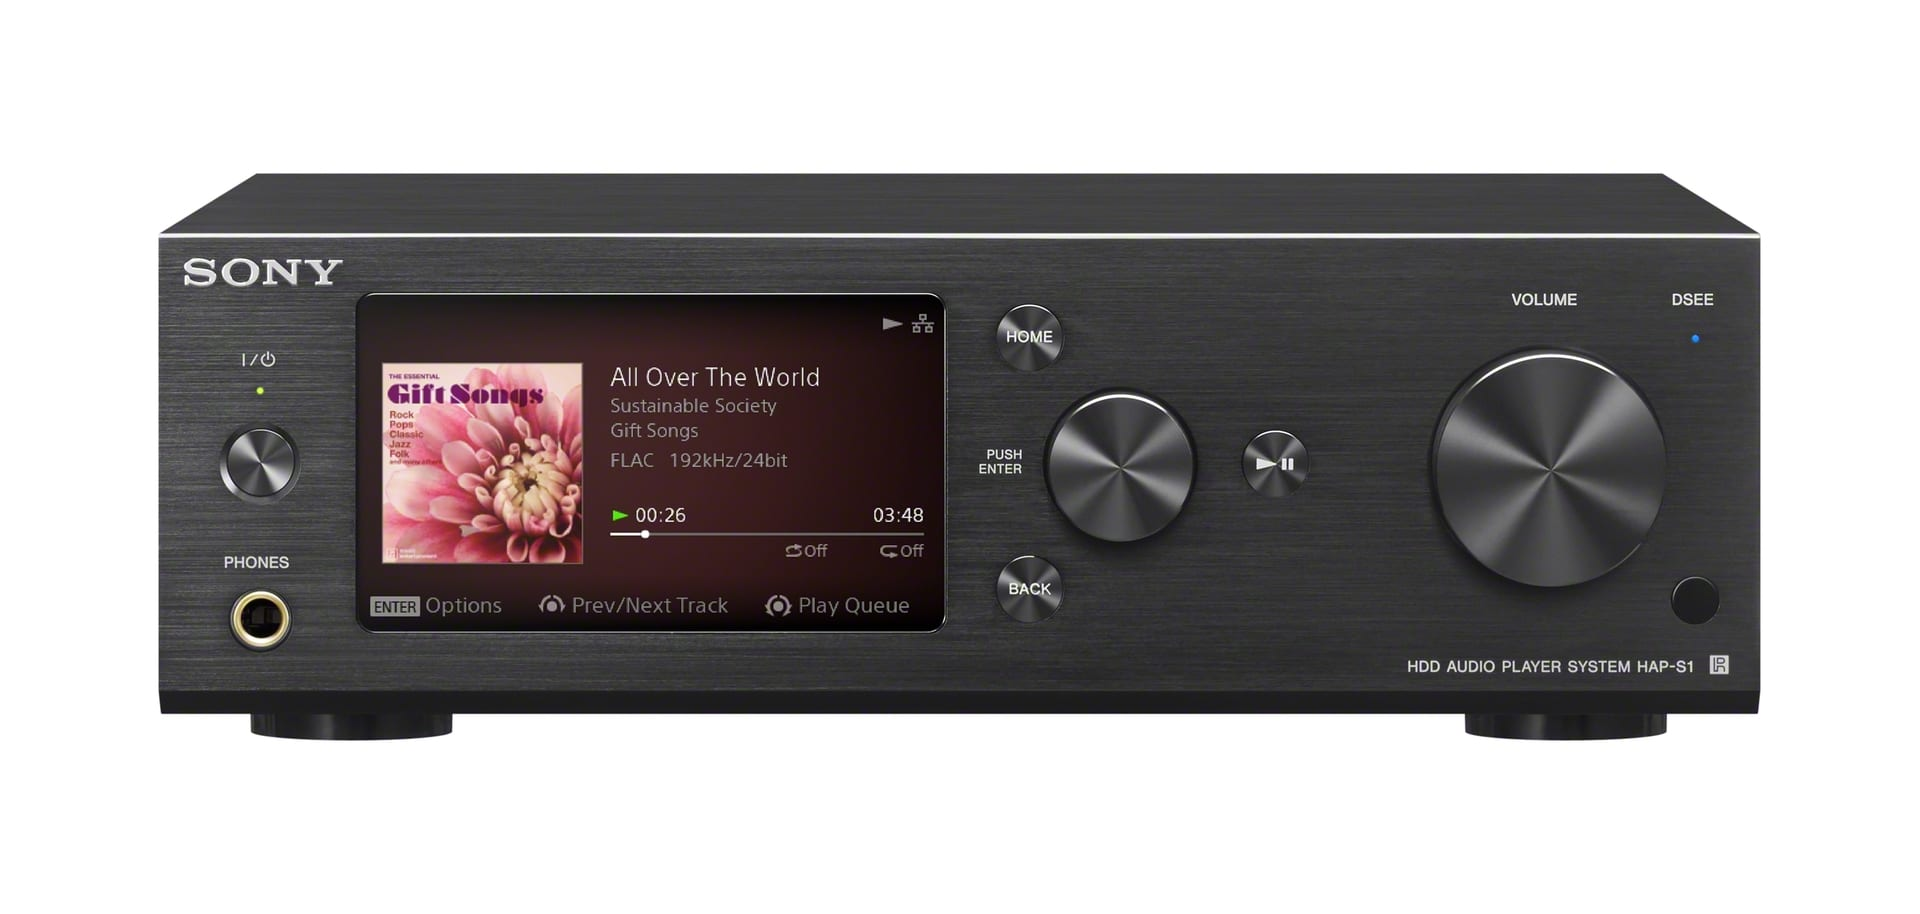 Sony Backs Hi-Res Audio Big Time